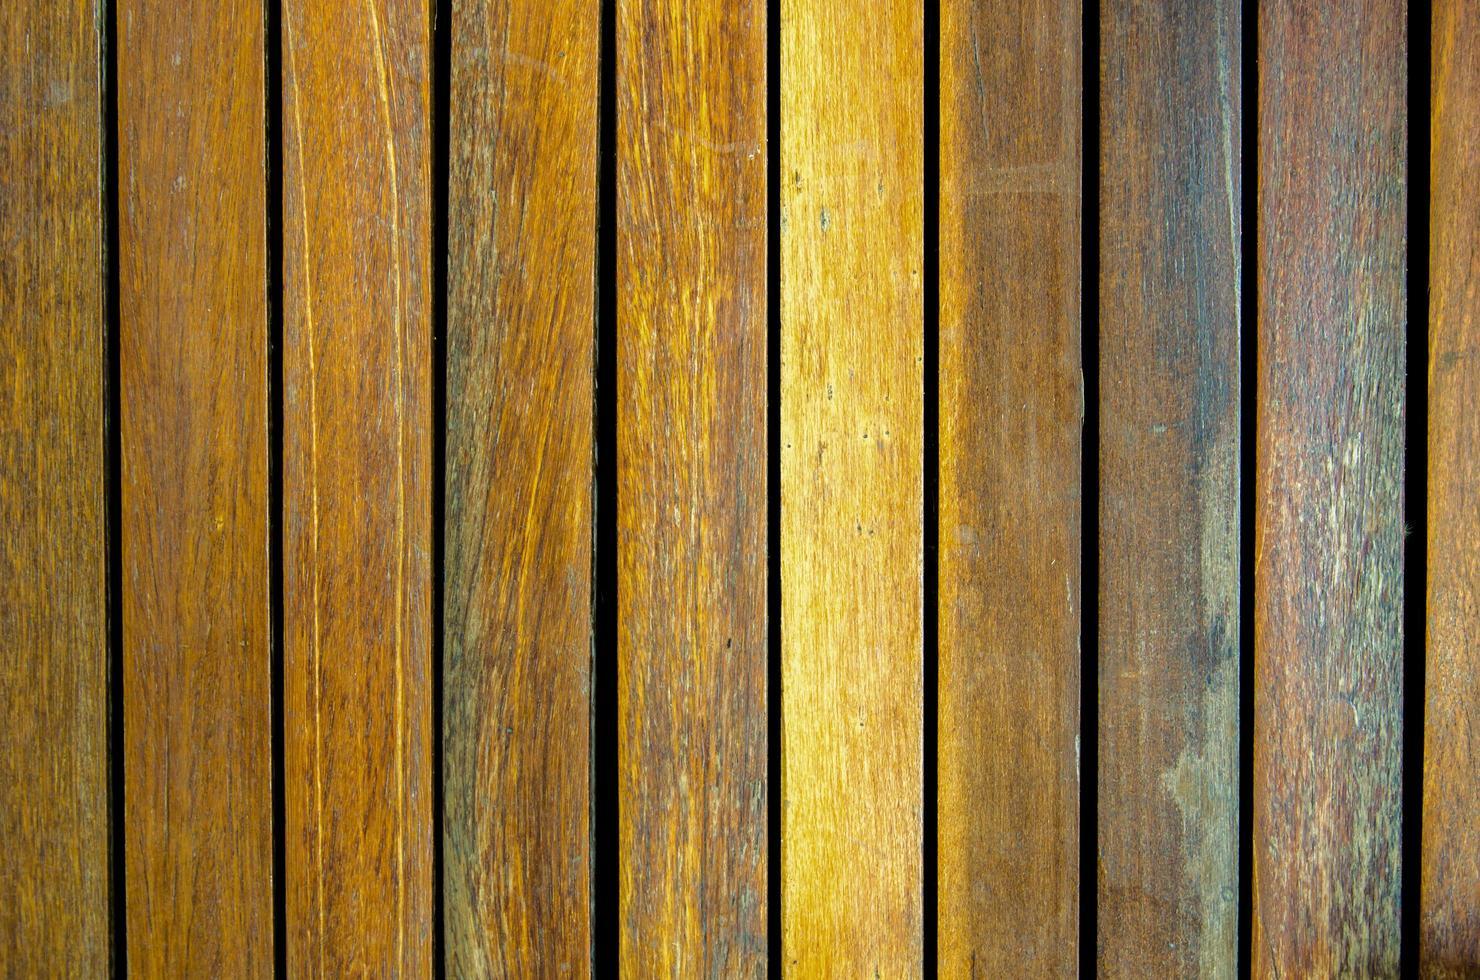 rustieke houten achtergrond foto